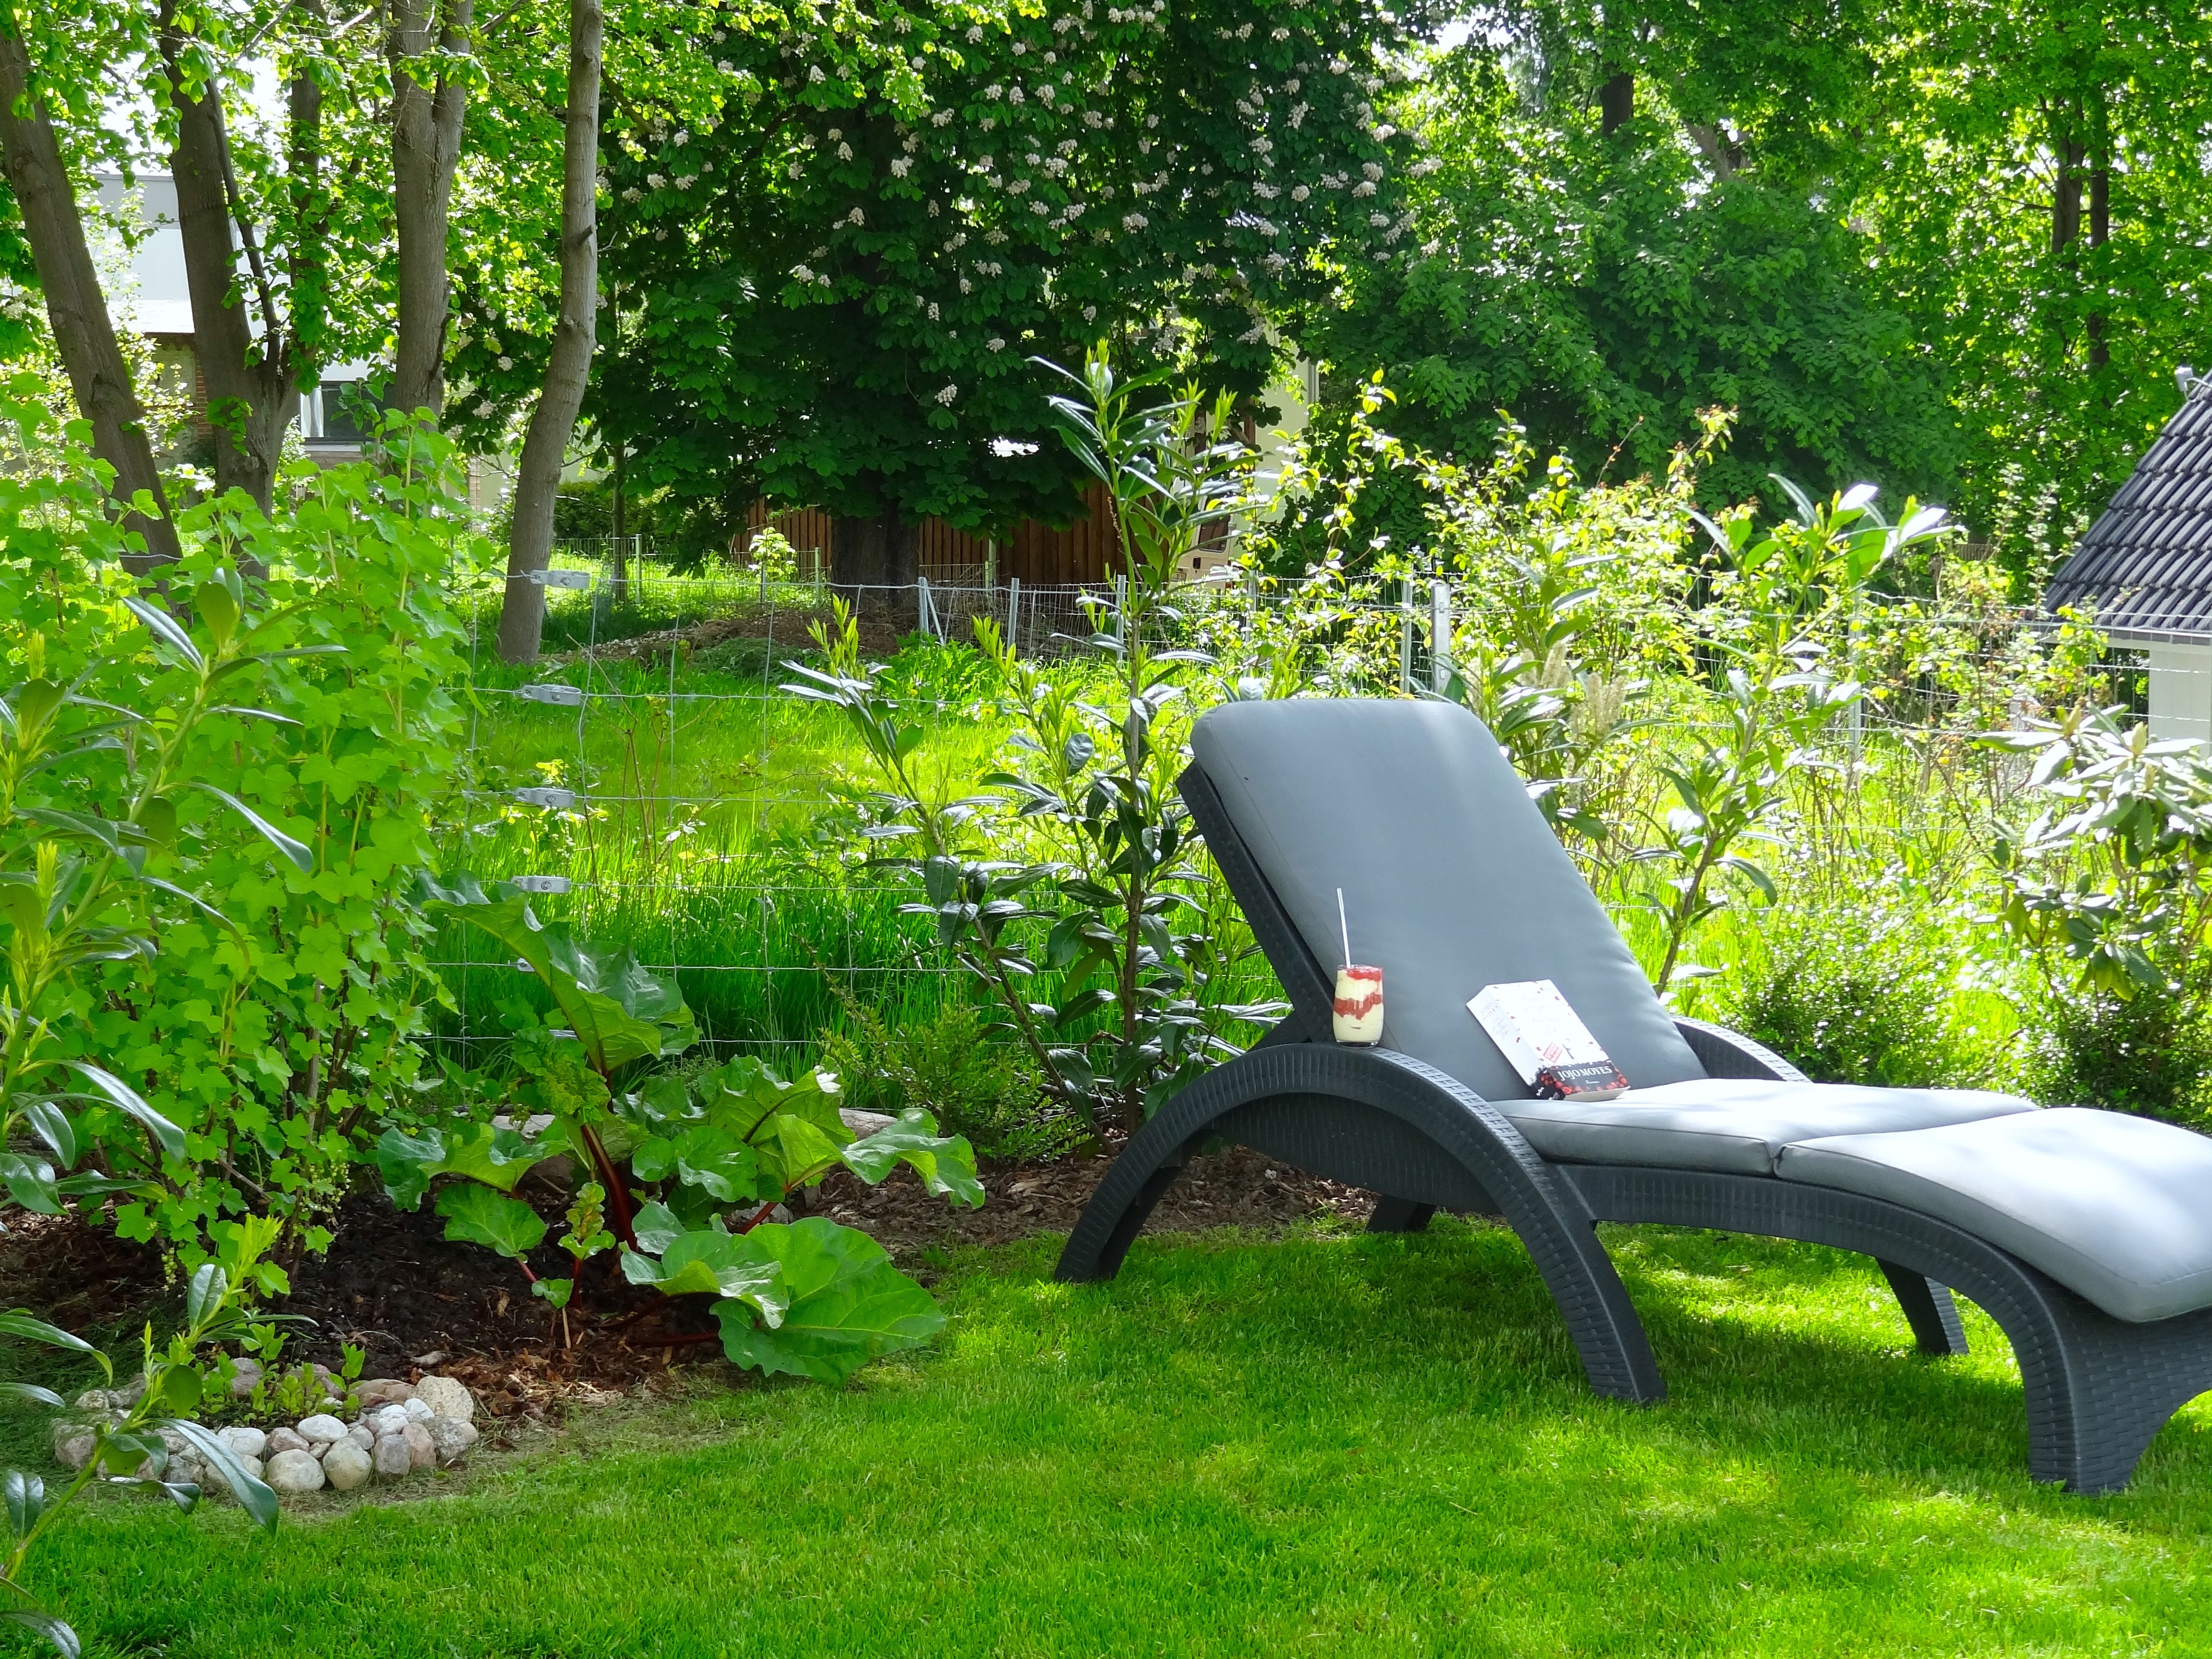 Ferienhaus Fleesensee Garten